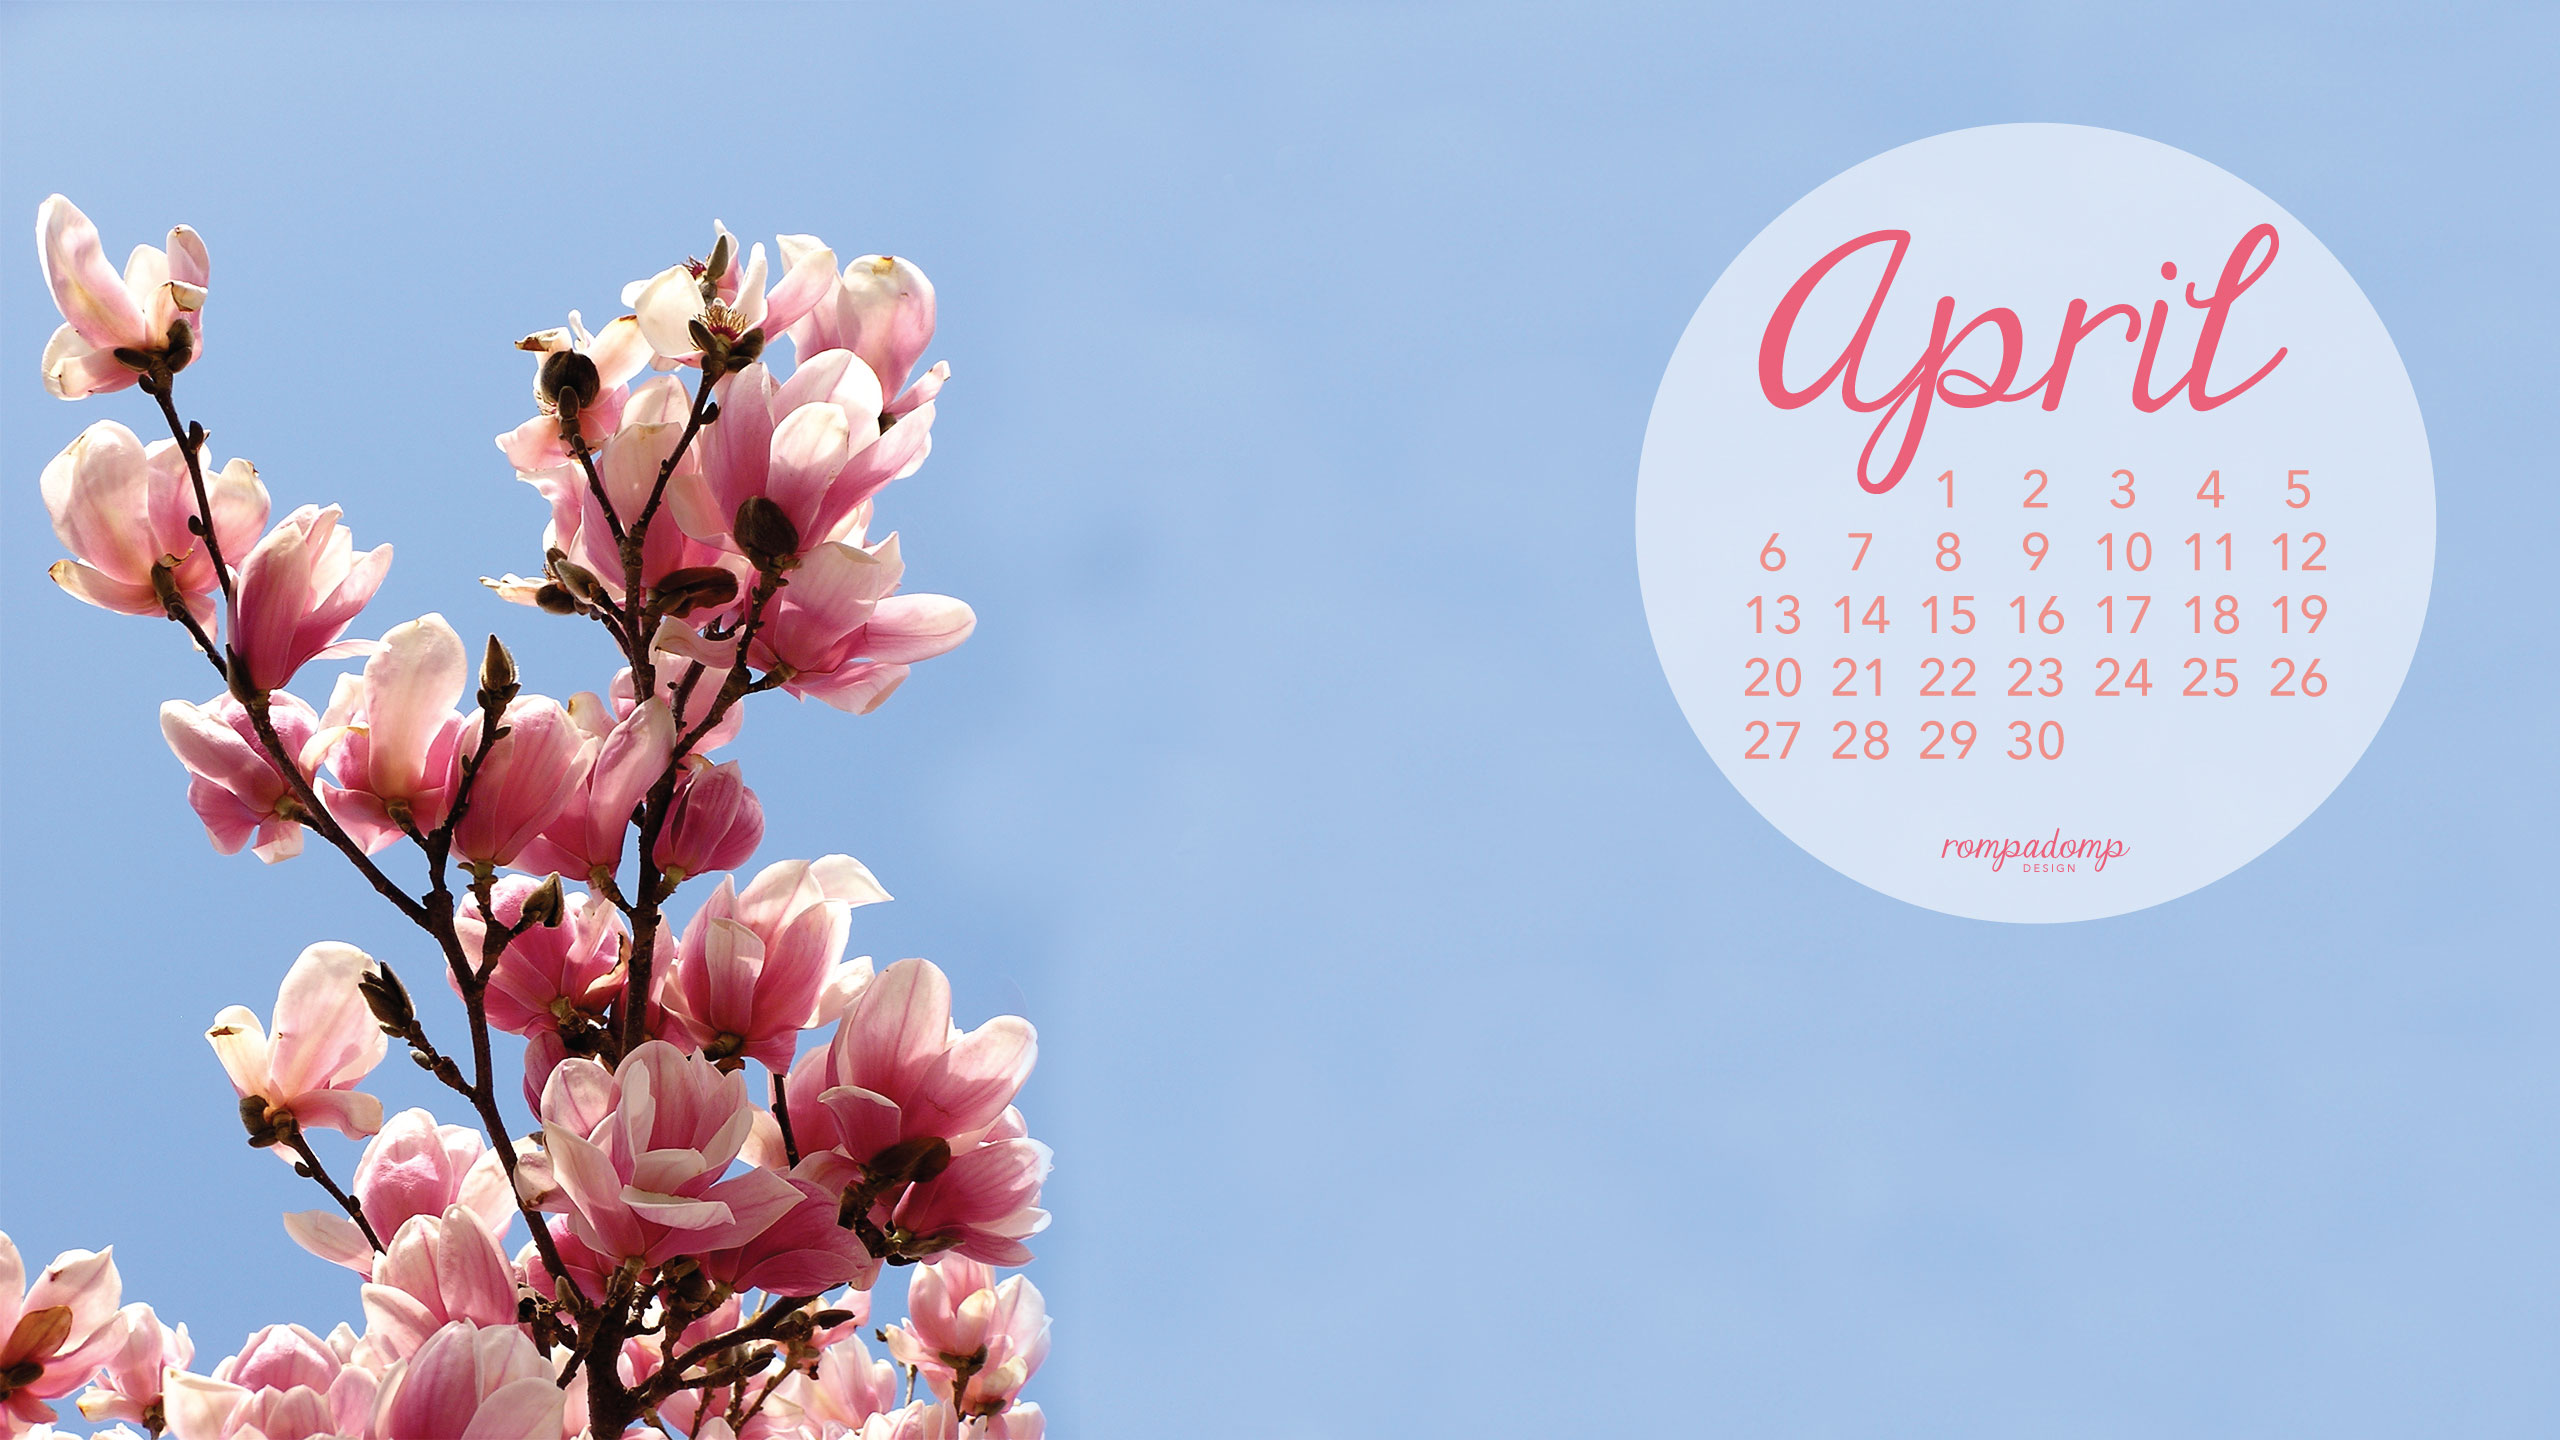 april desktop calendar wallpaper 2560 x 1440jpg 2560x1440